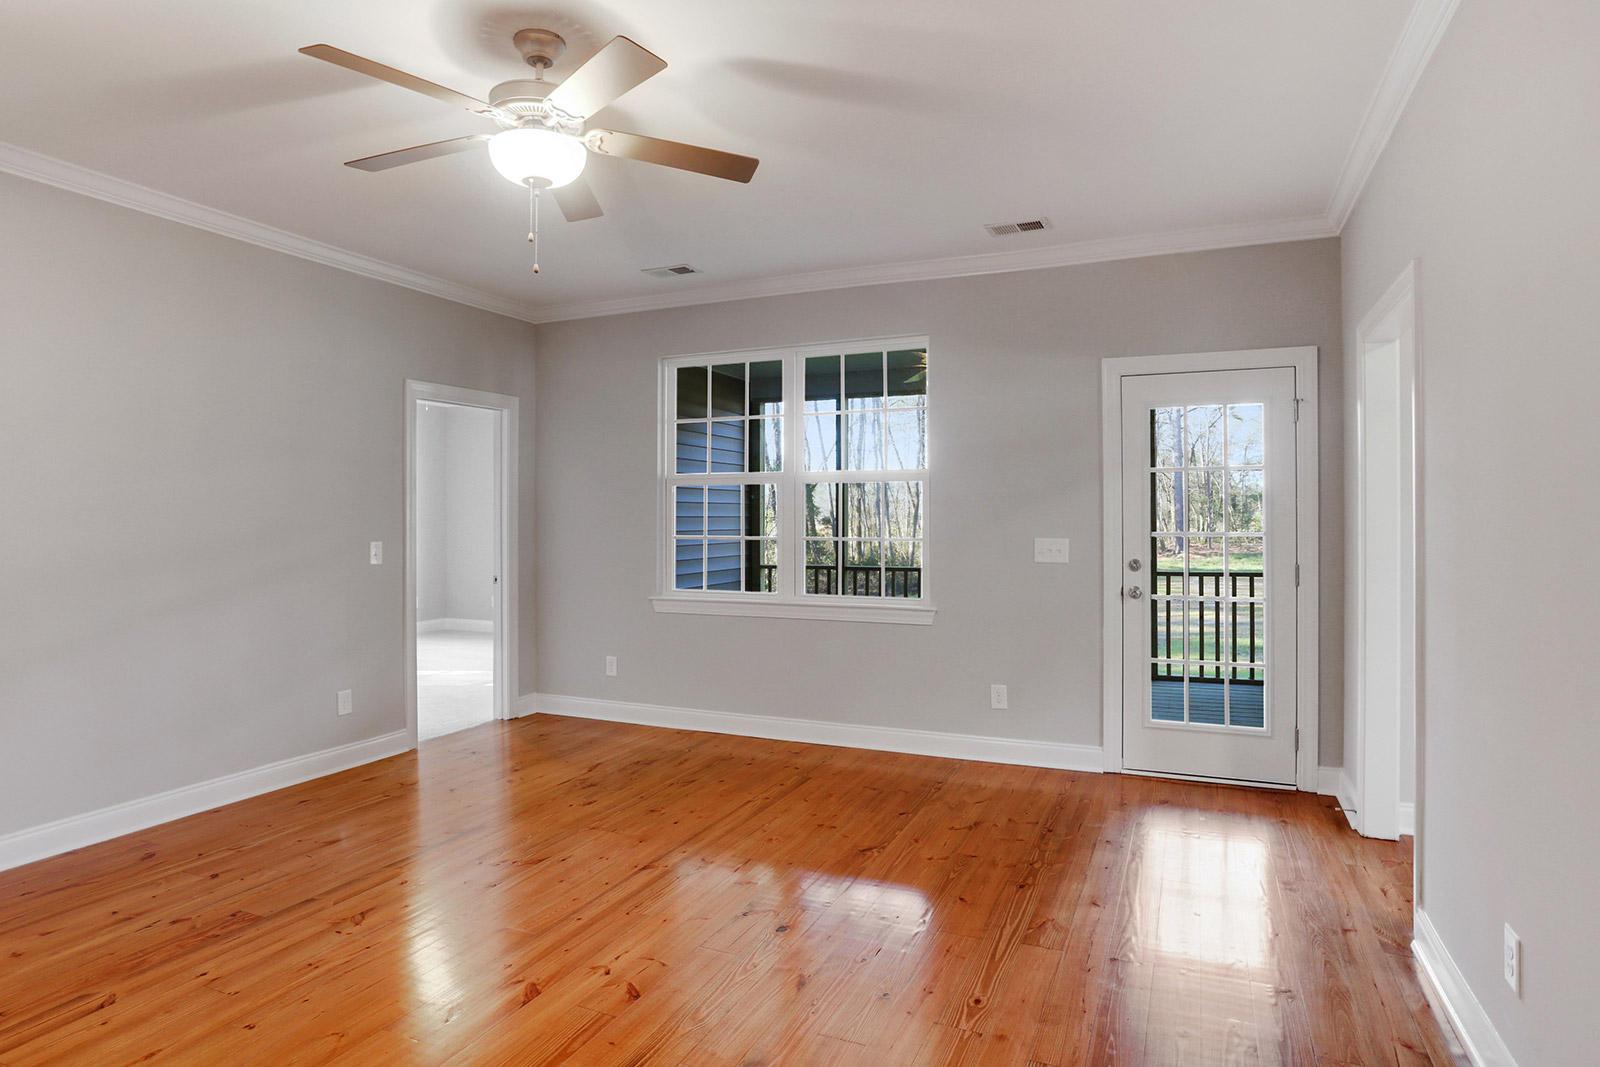 Britton Homes For Sale - 3175 Edenvale, Johns Island, SC - 6